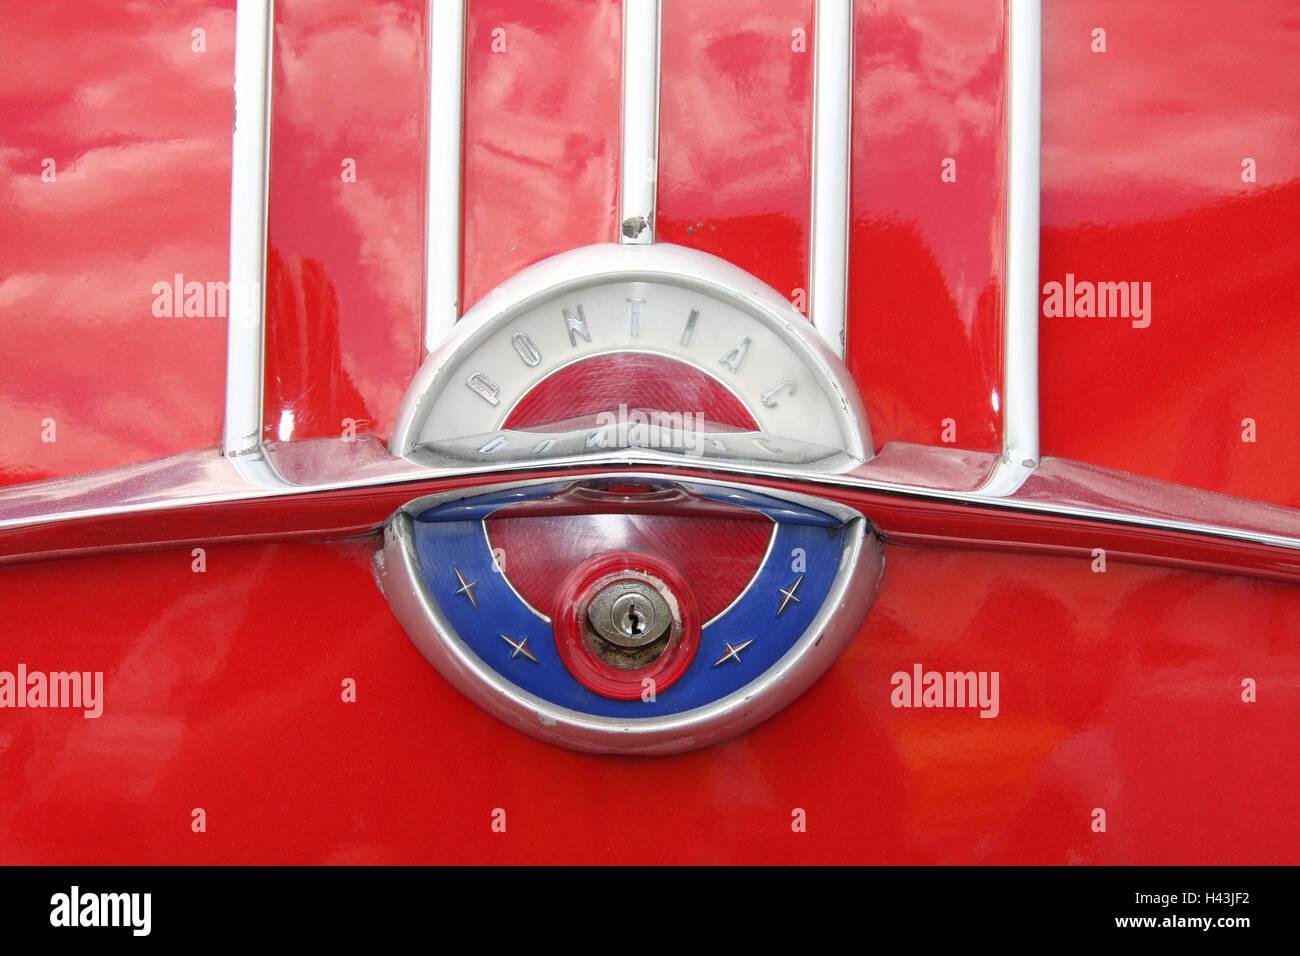 Bonnet Emblem Stock Photos Bonnet Emblem Stock Images Alamy